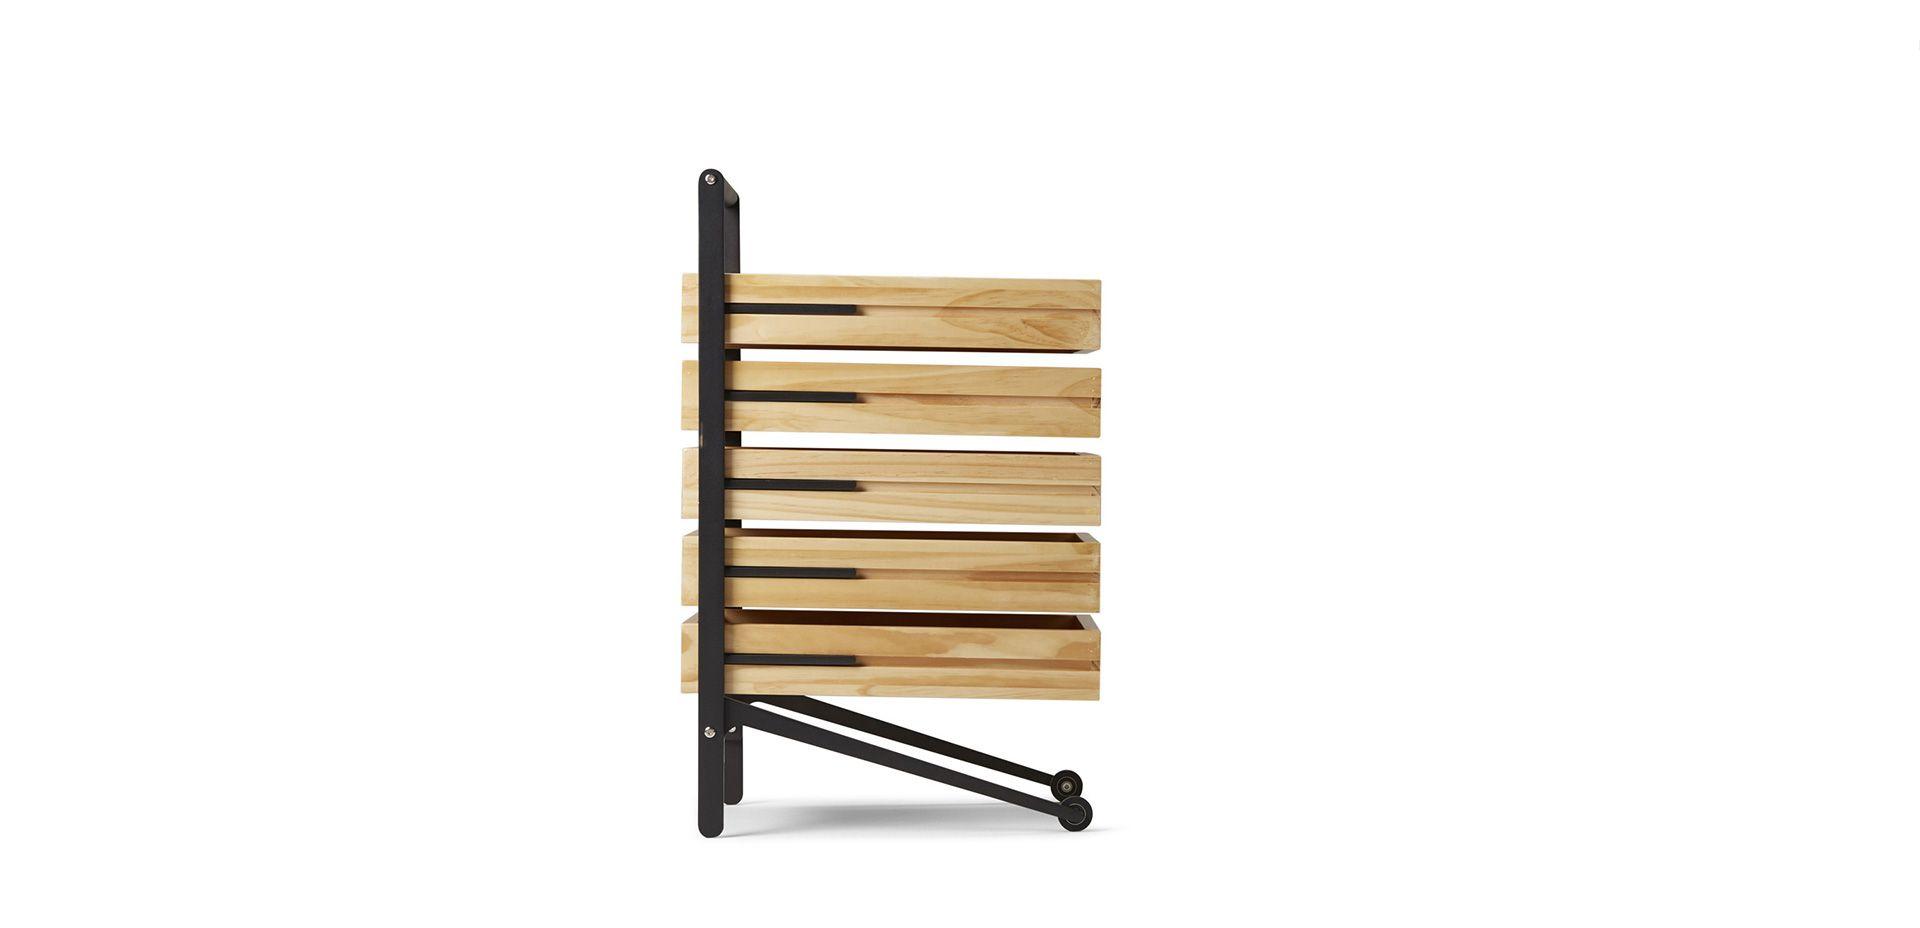 造作 京都手推柜 严谨的日式美学 是你的工作良伴 outdoor chairs outdoor decor decor